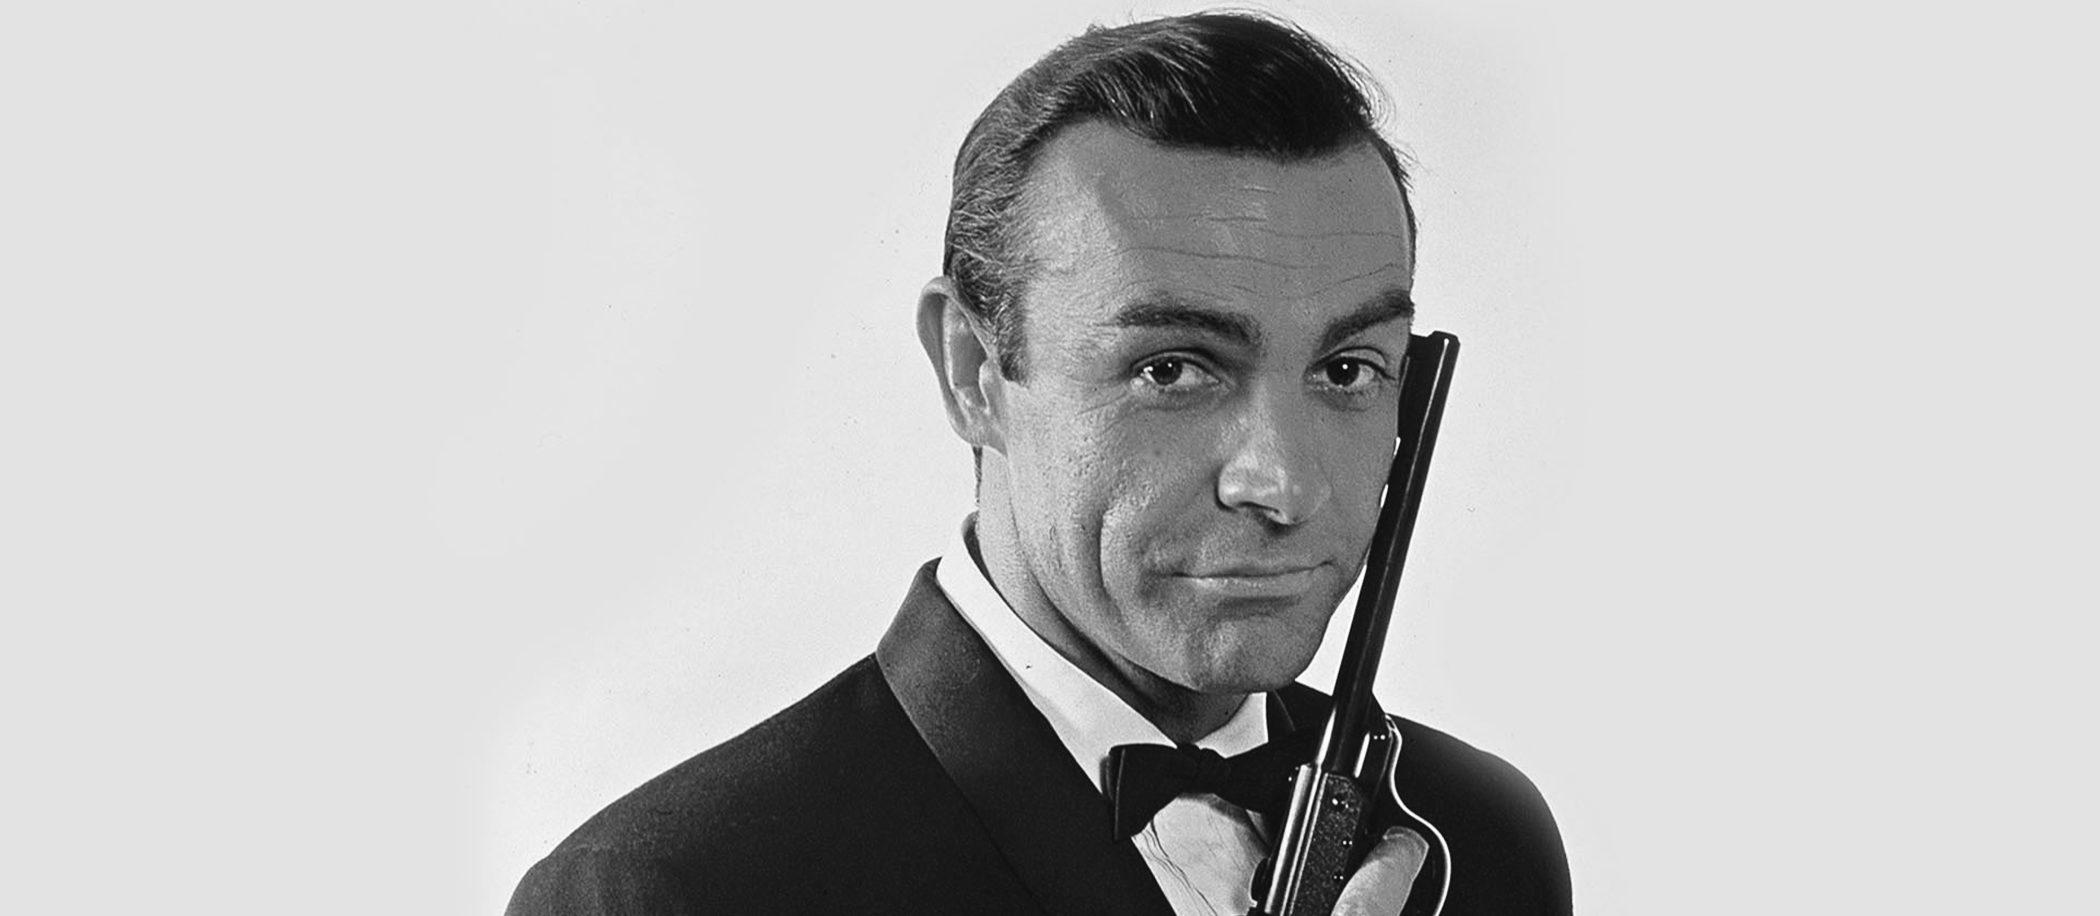 Sean Connery jako James Bond / foto: 007.com